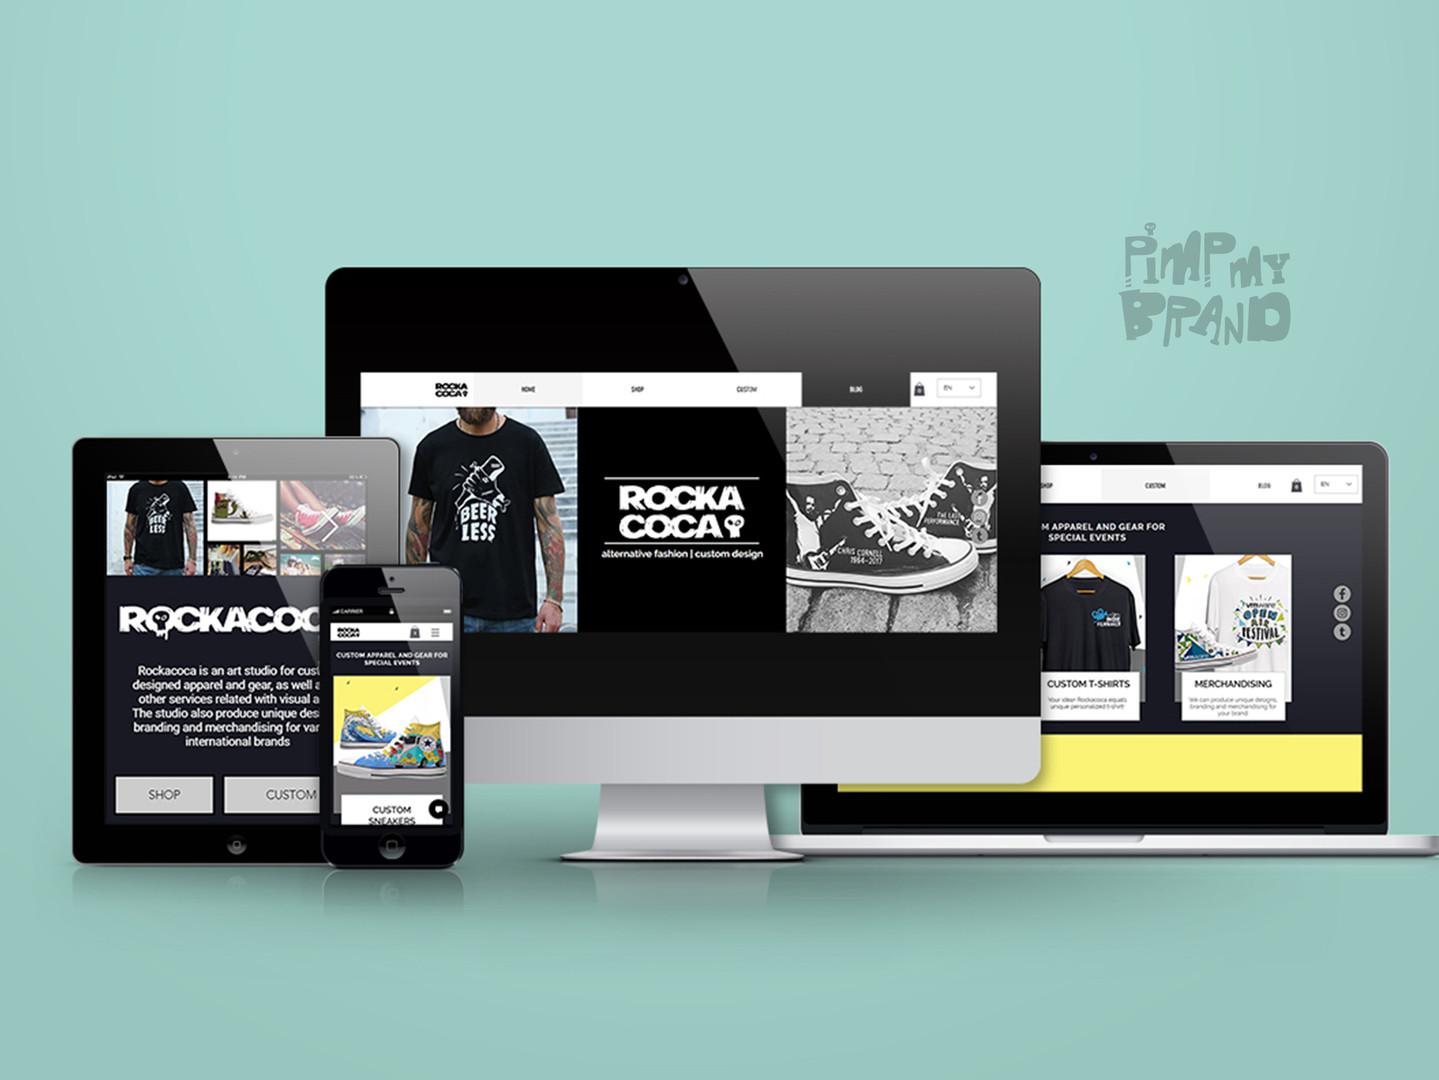 Rockacoca Store Website Design